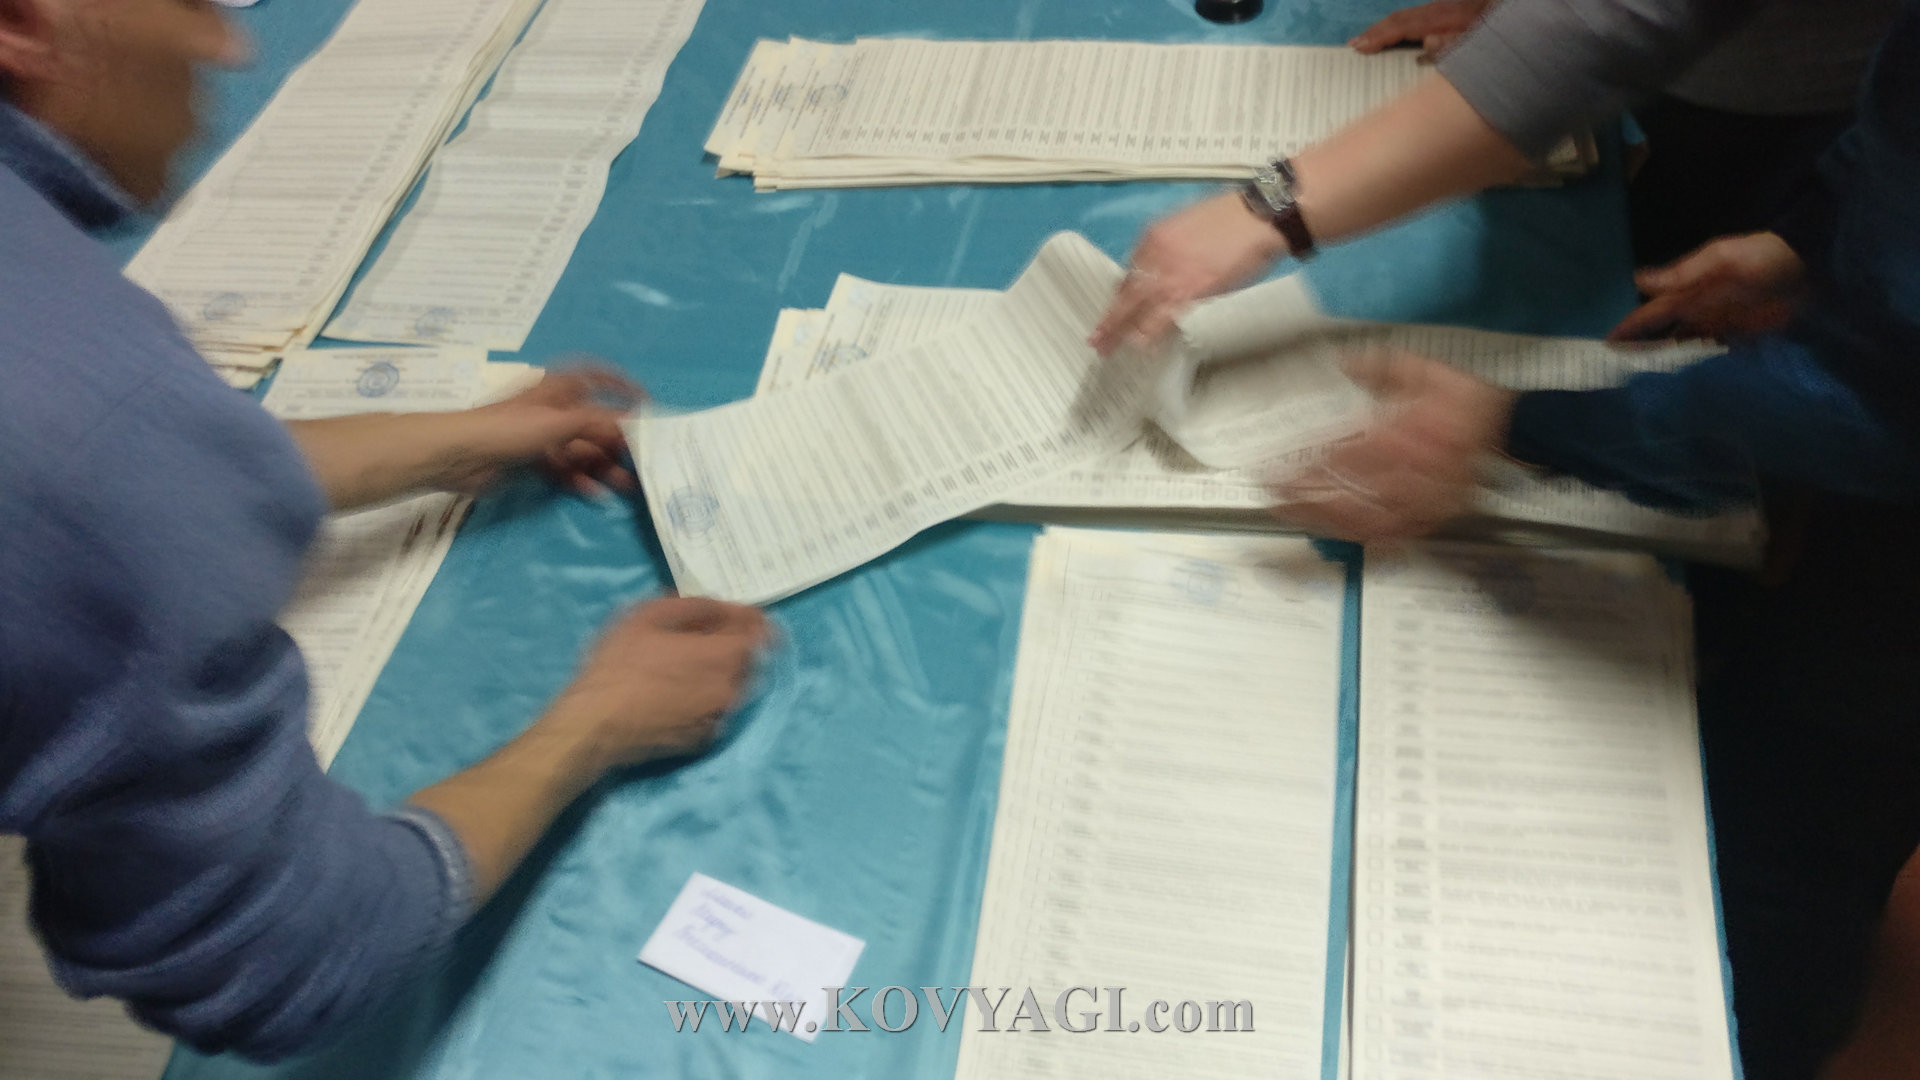 vybory-31032019-10